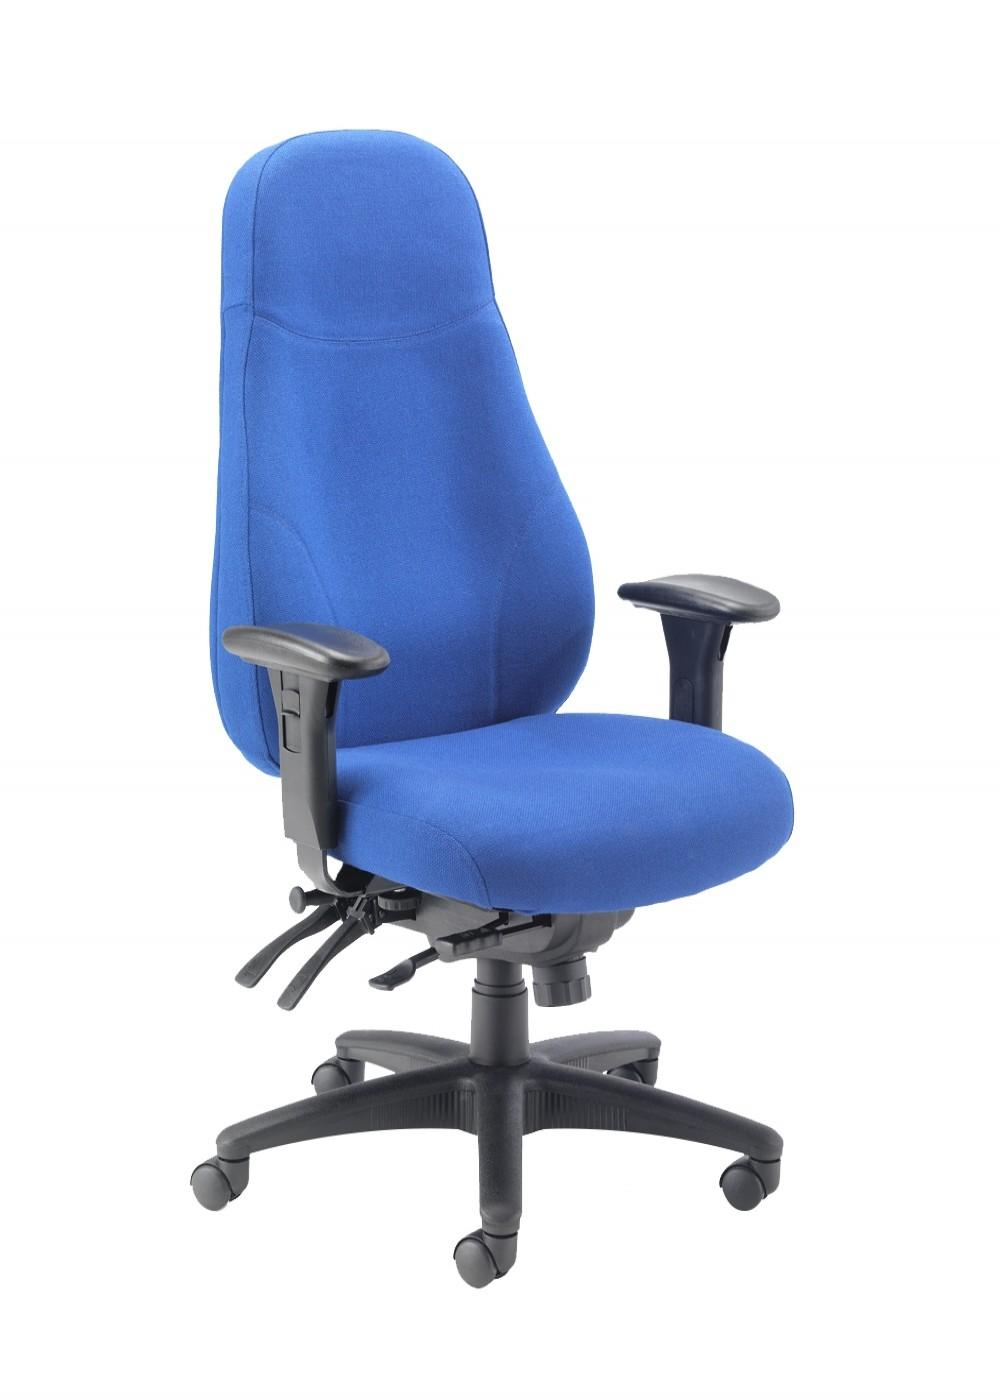 TC Cheetah High Back Office Chair CH1111MA  121 Office